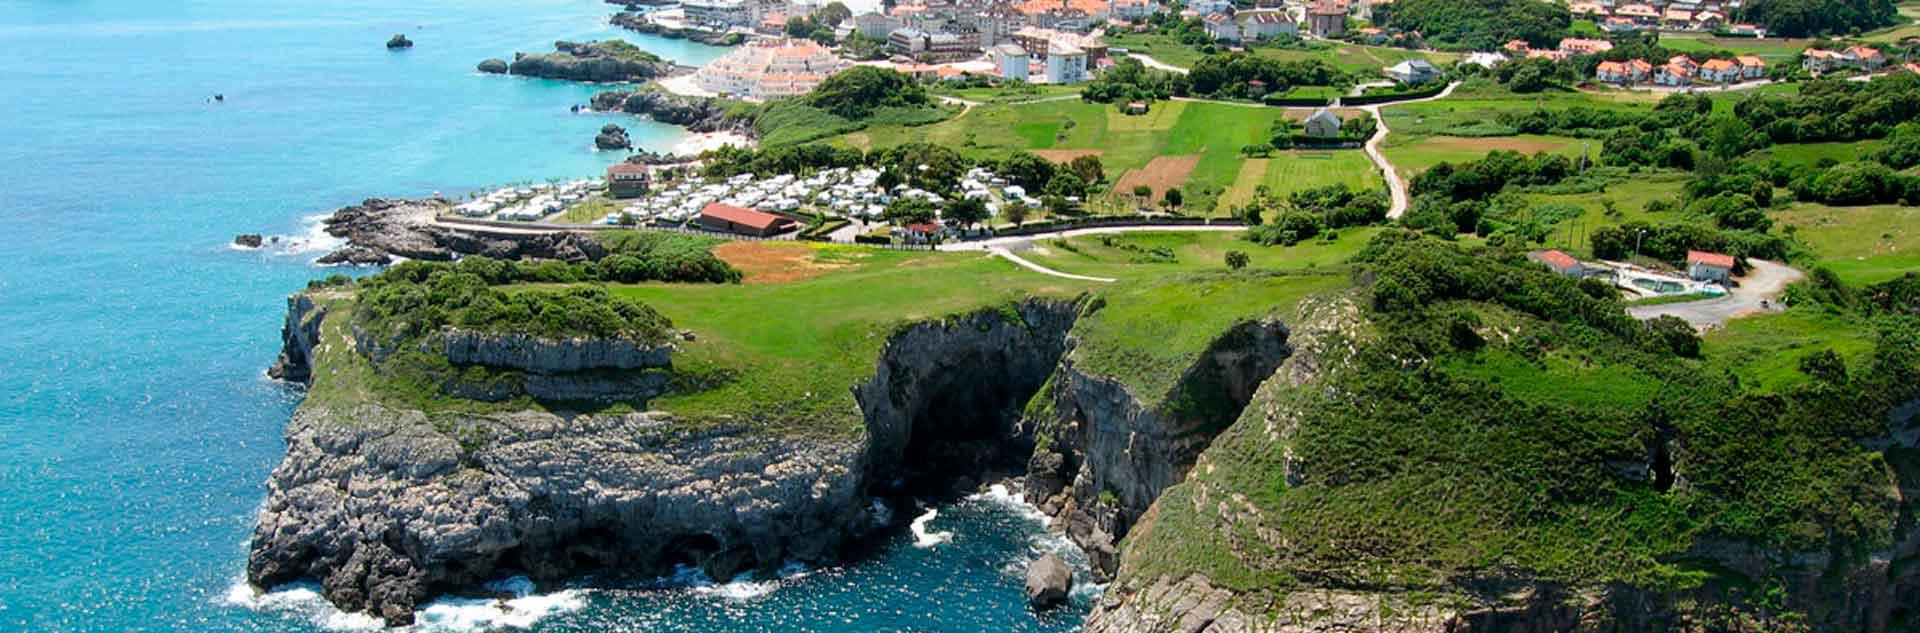 Vista panorámica de Isla, en Cantabria